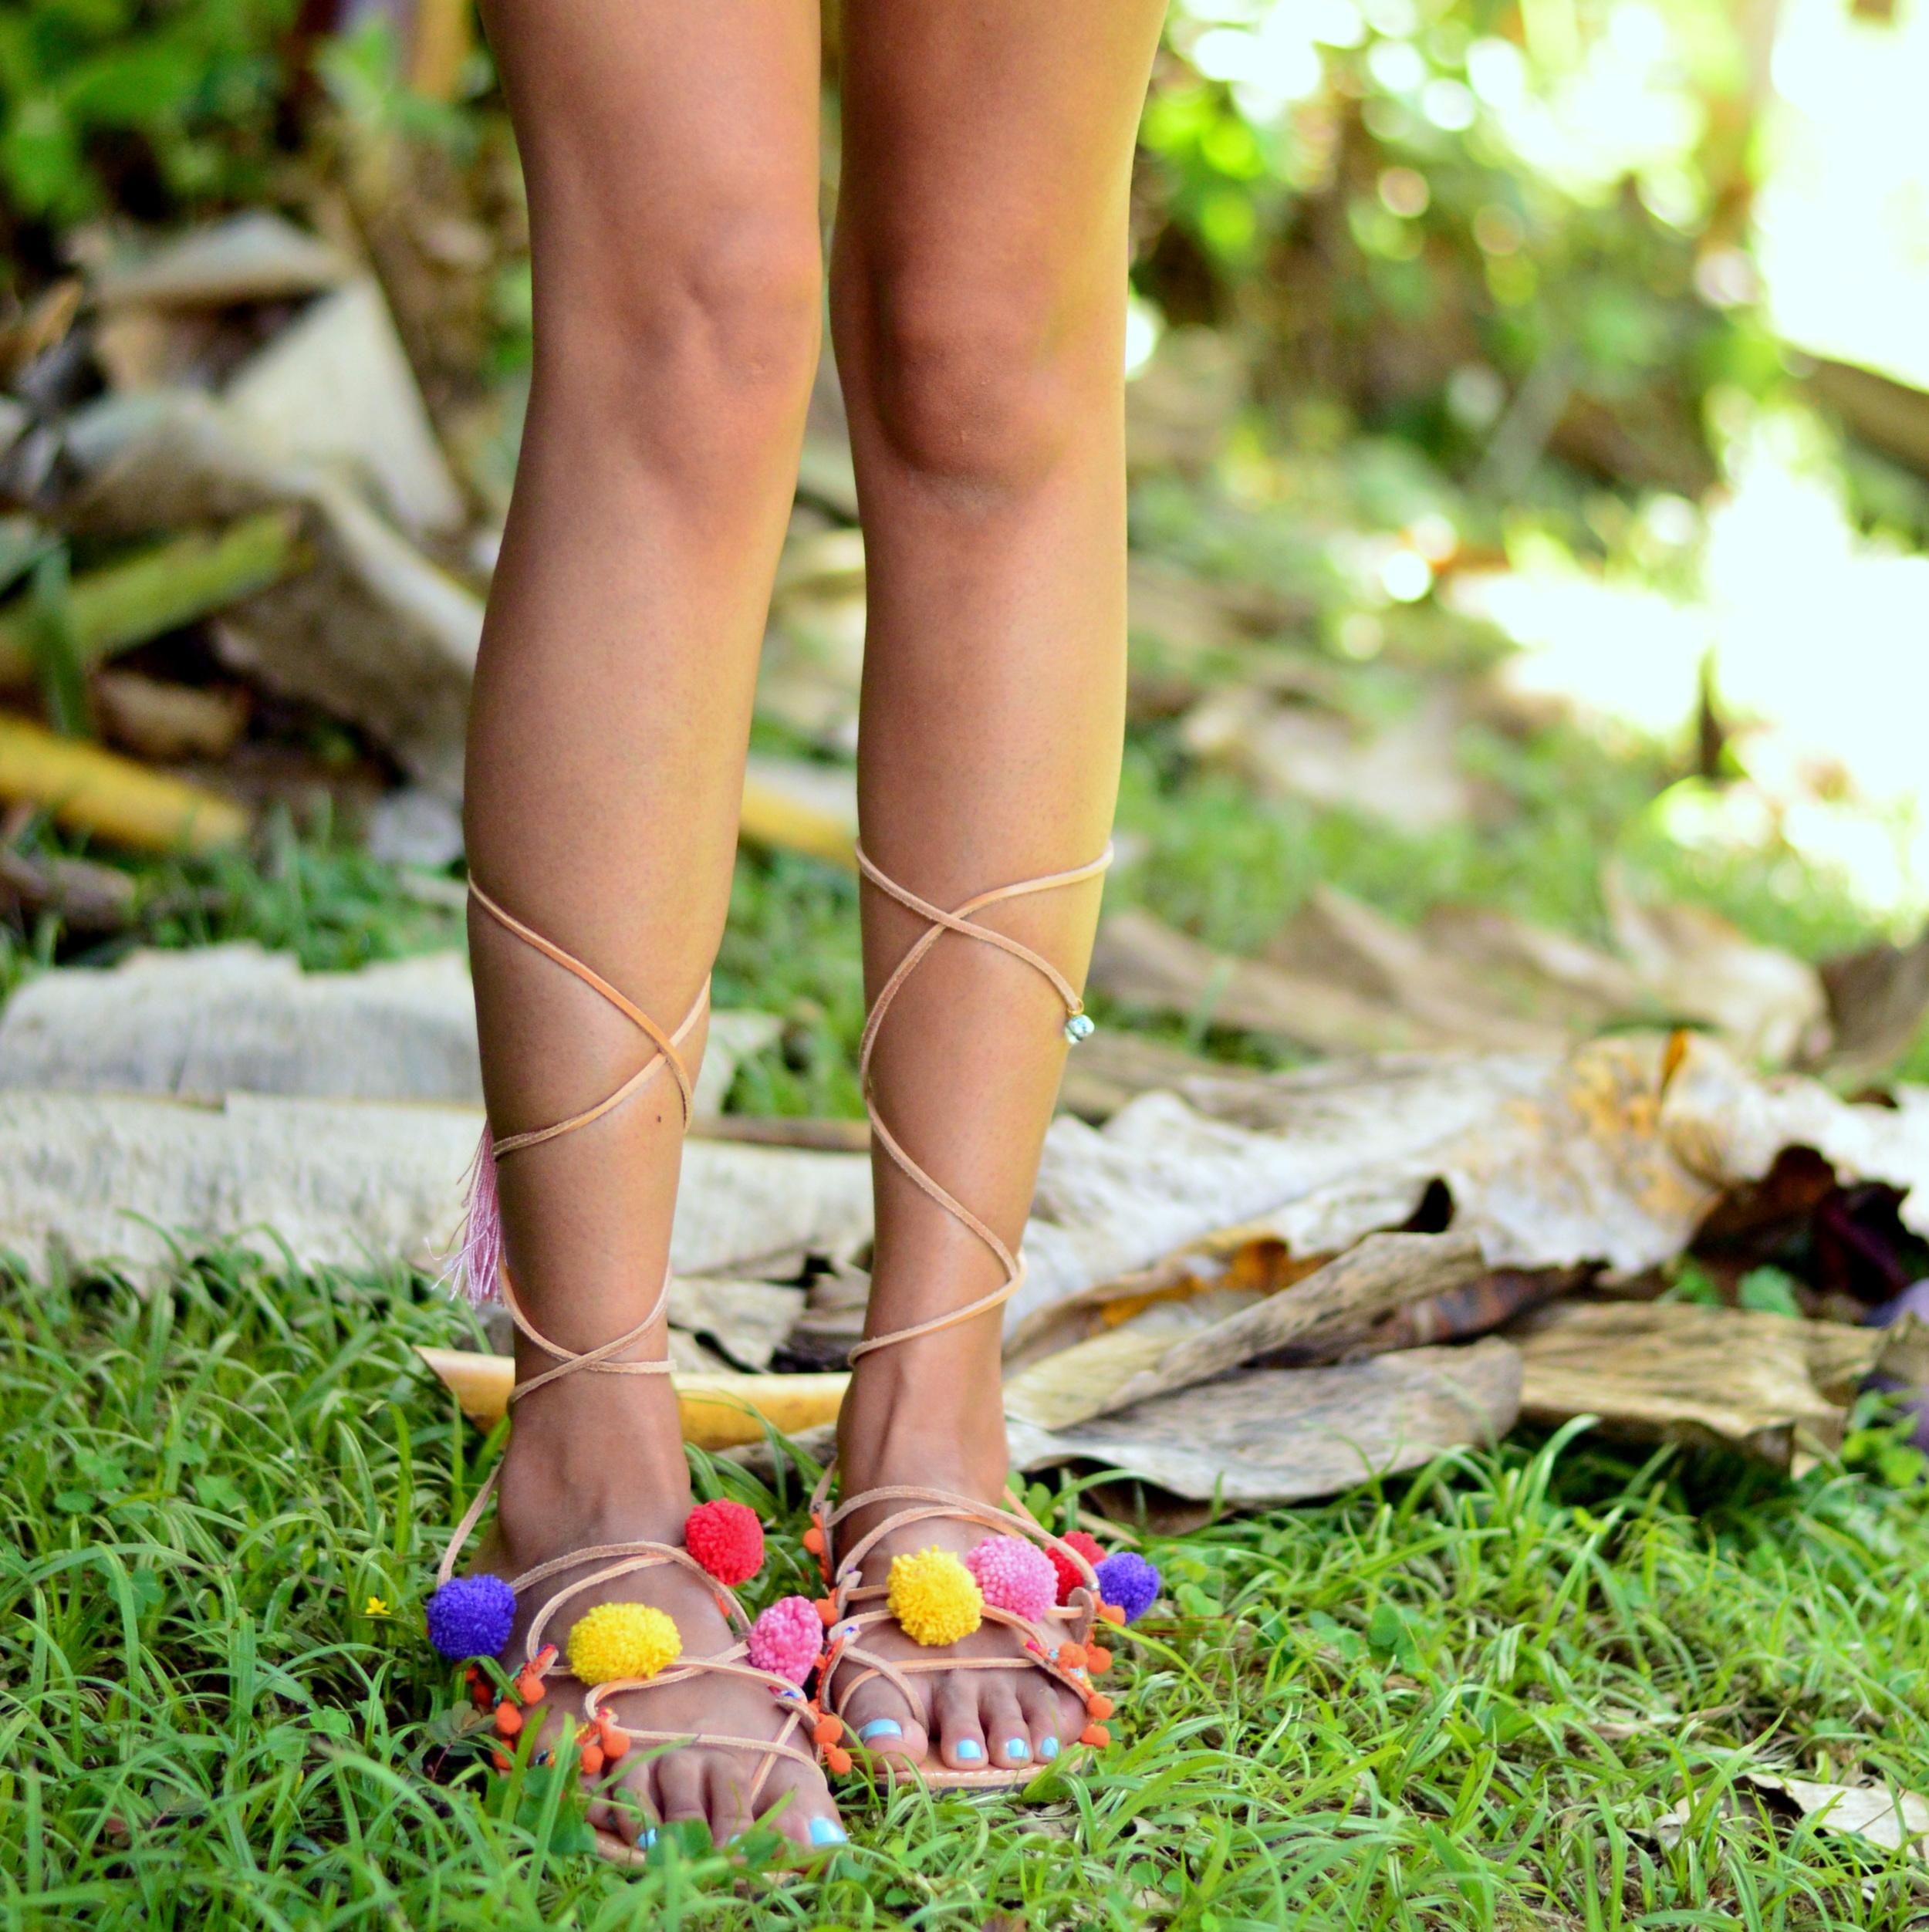 pom-pom-sandals-vacation-style